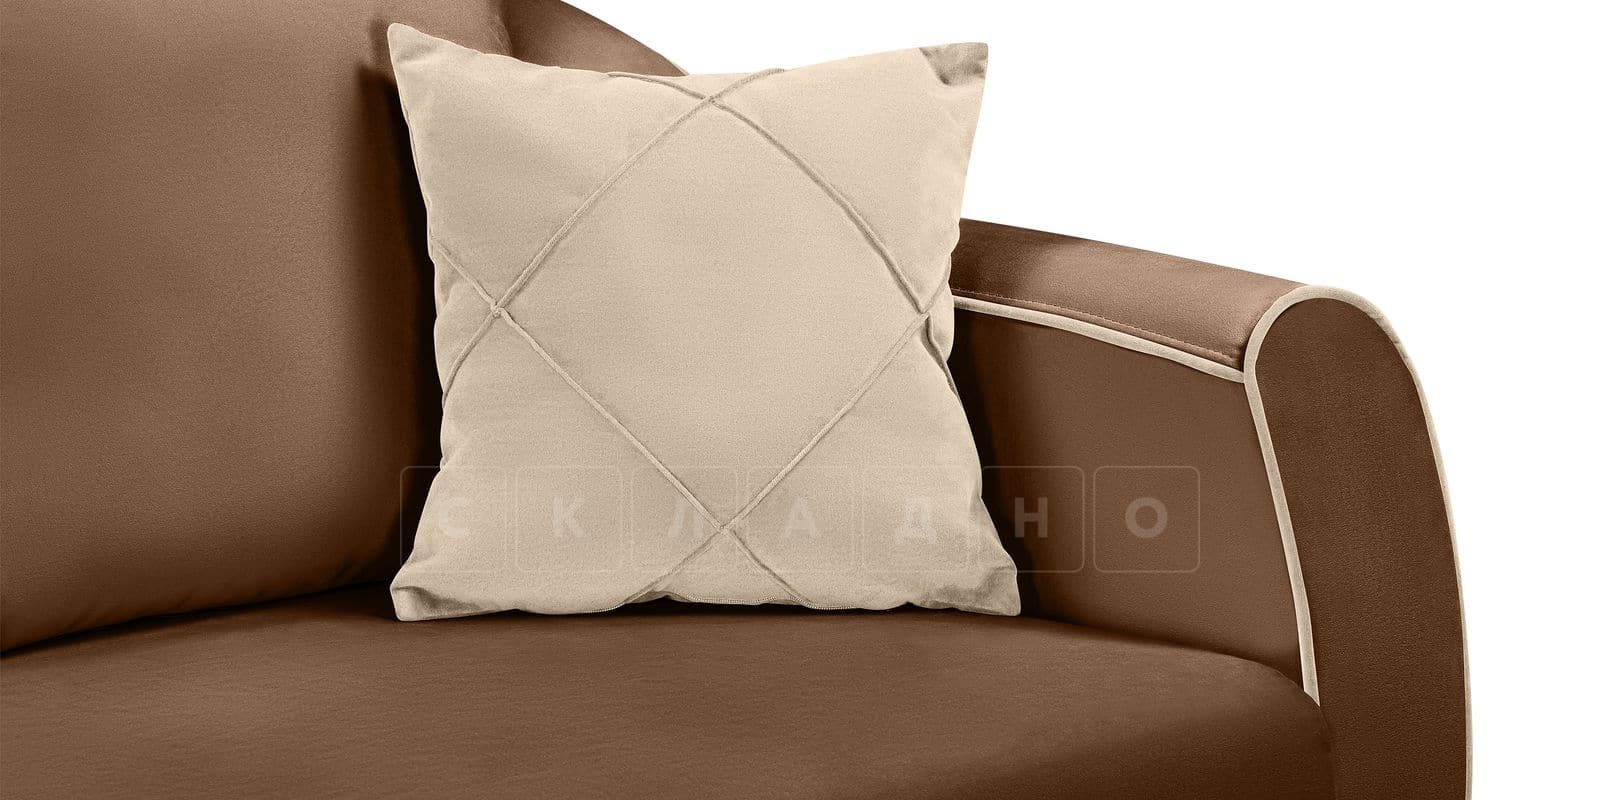 Диван Флэтфорд велюр коричневый фото 7 | интернет-магазин Складно